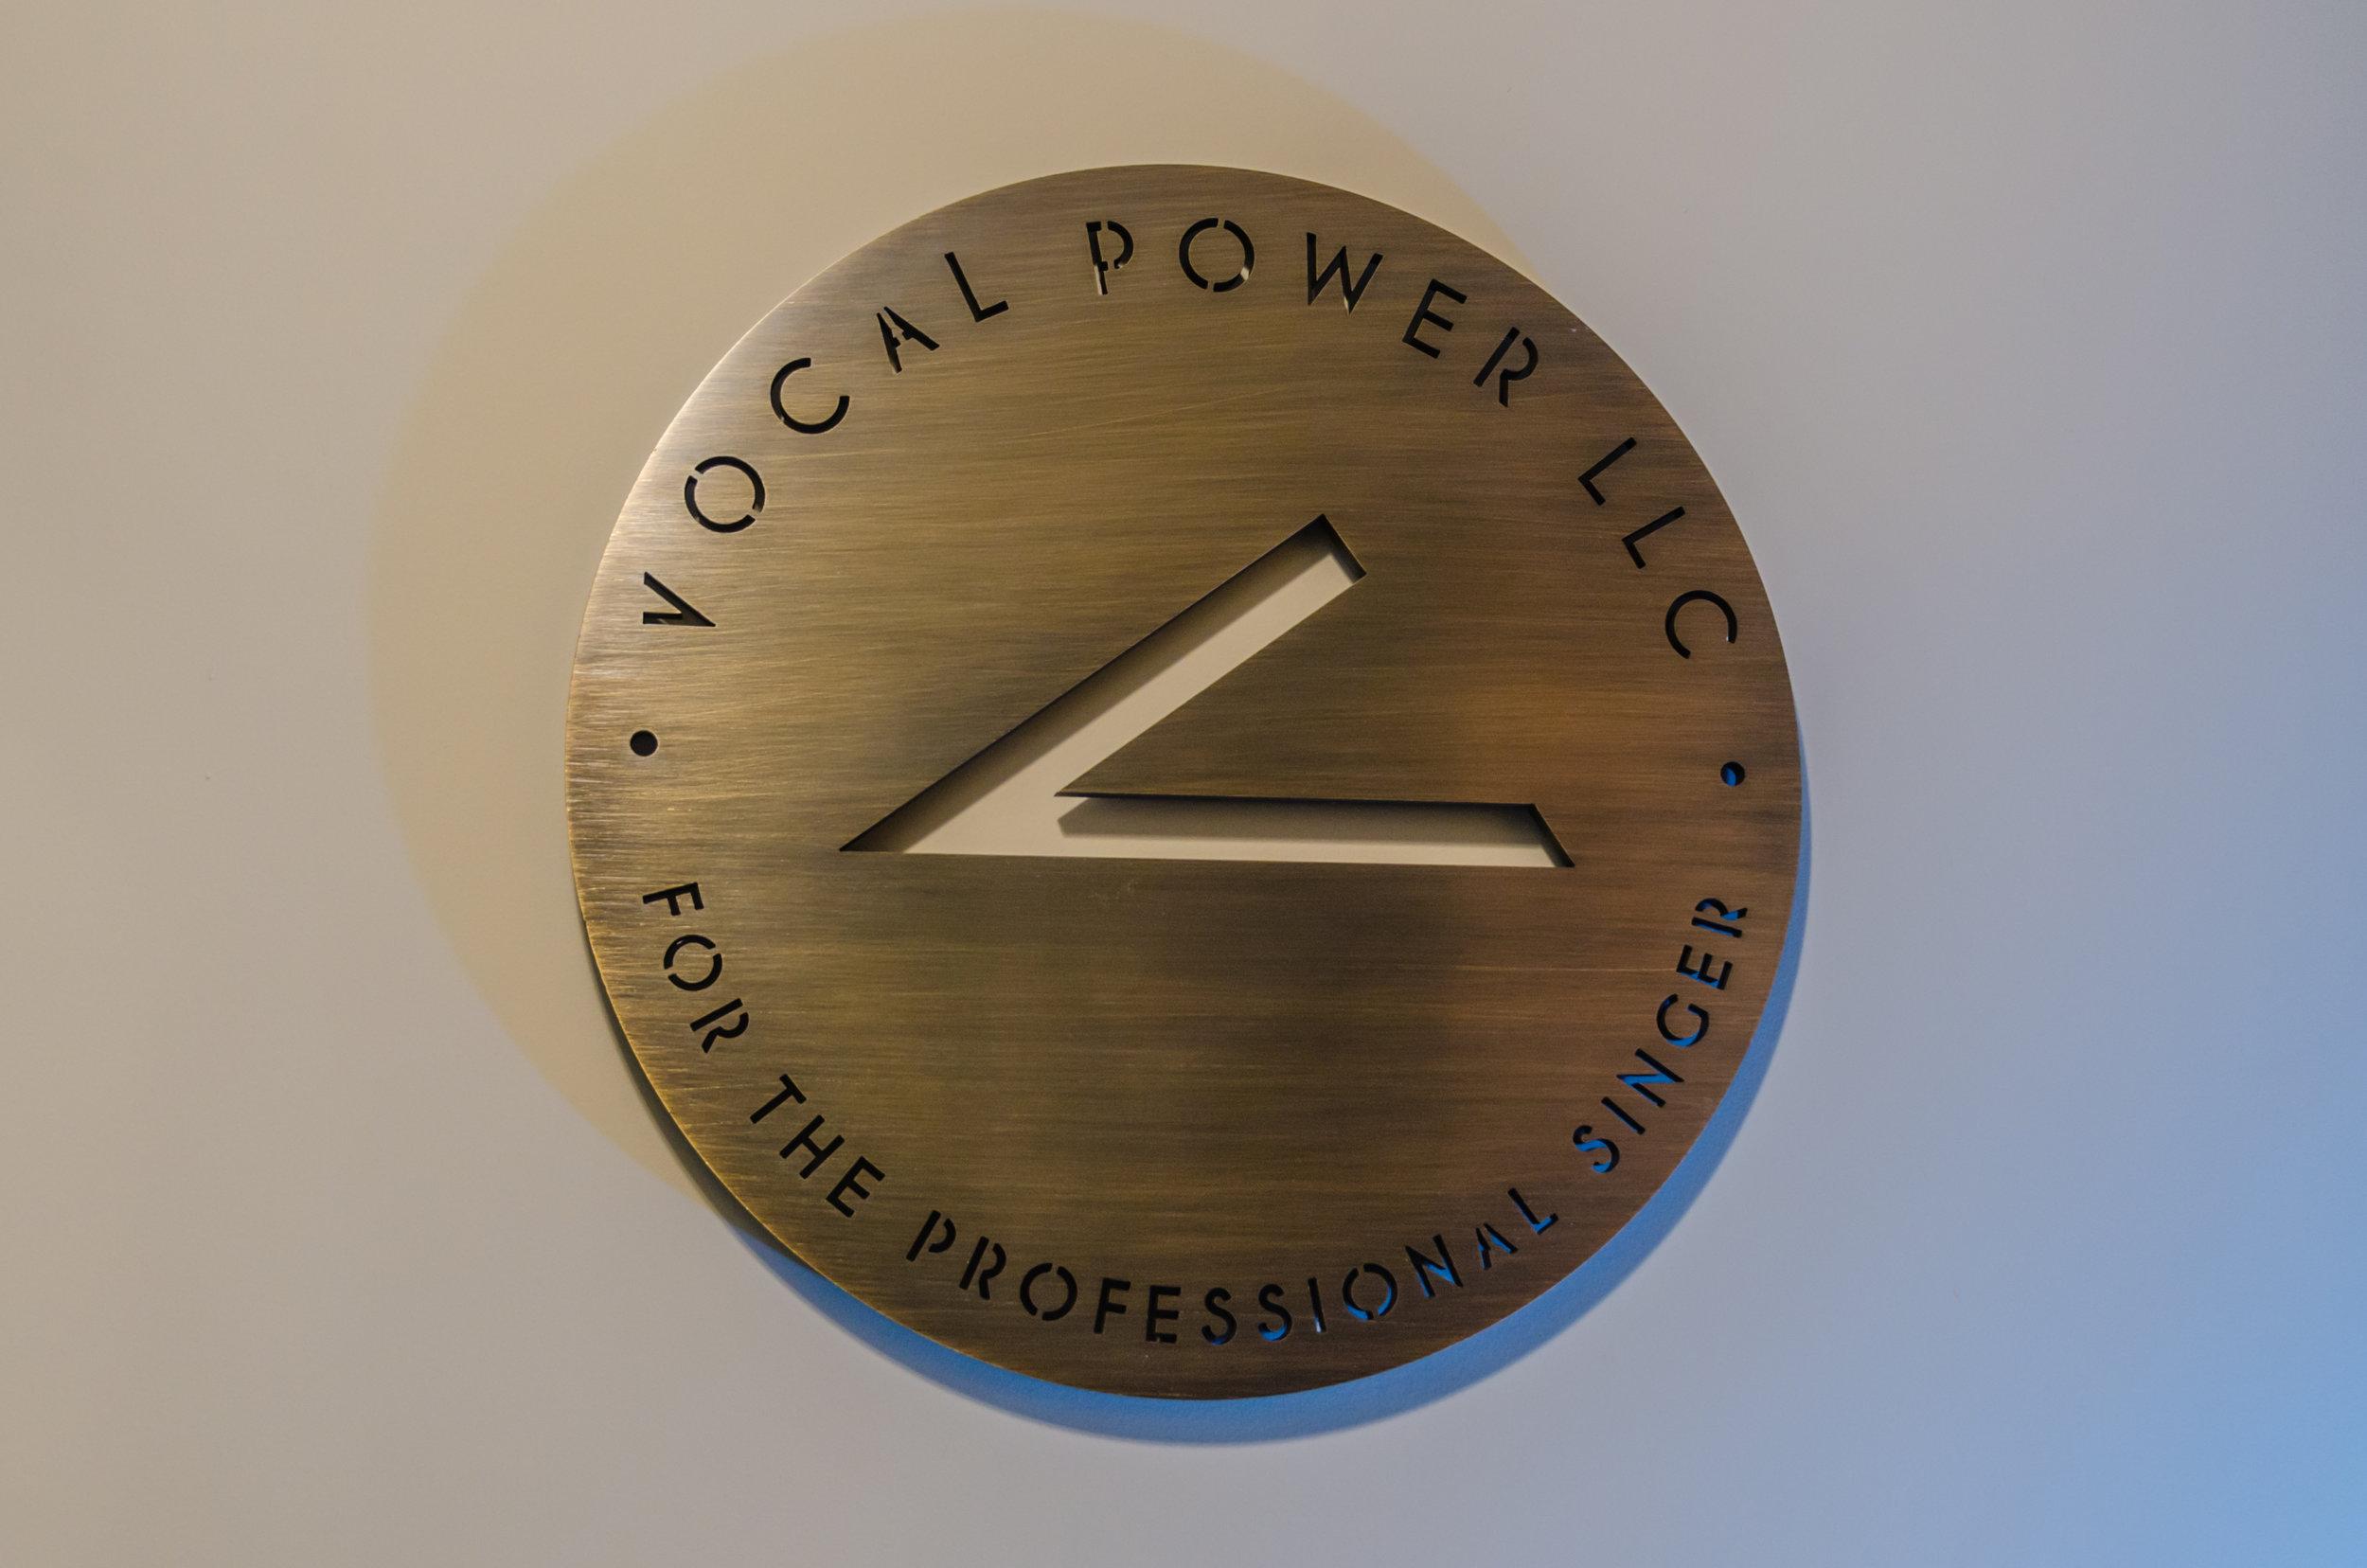 Vocal Power studio_0096edit.jpg